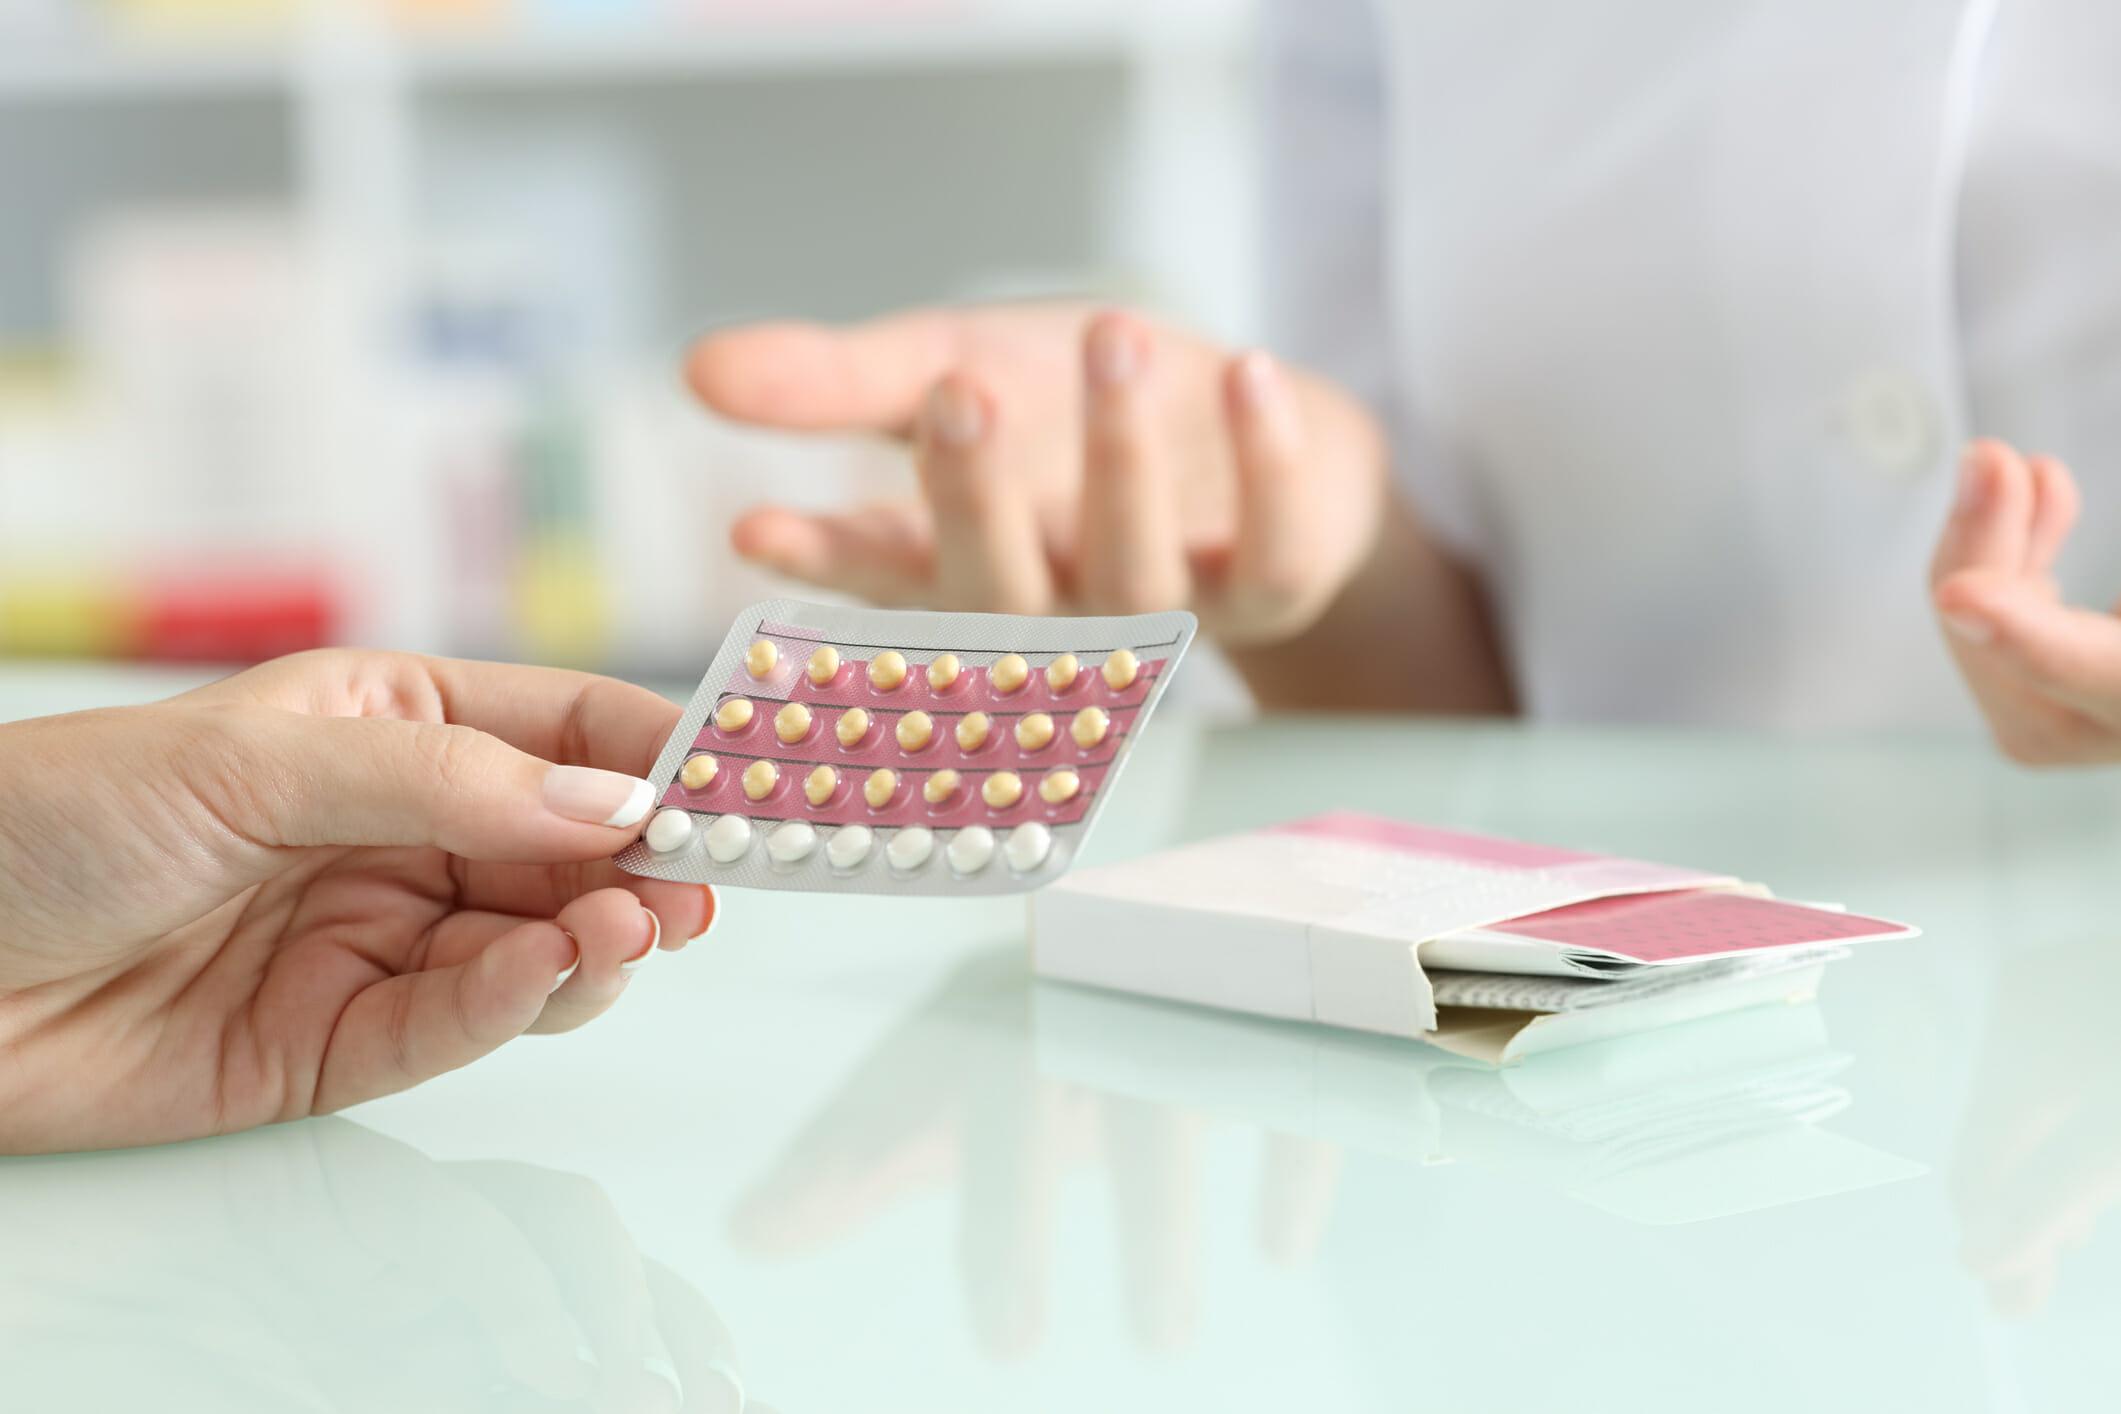 antibeebipillid